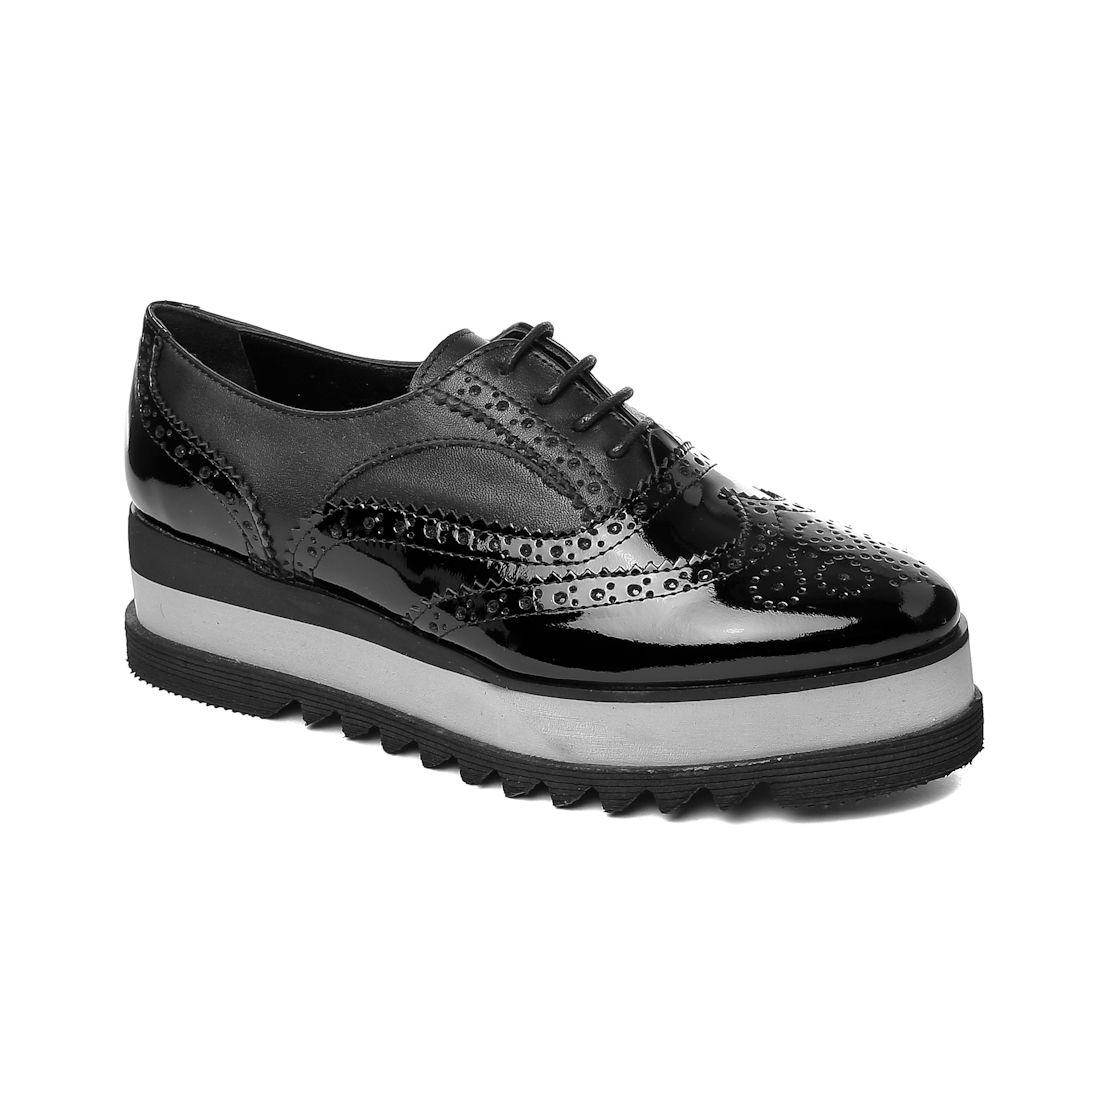 ck John May Femme Oxford-Shoe Cet 7615-03 Mocau ck